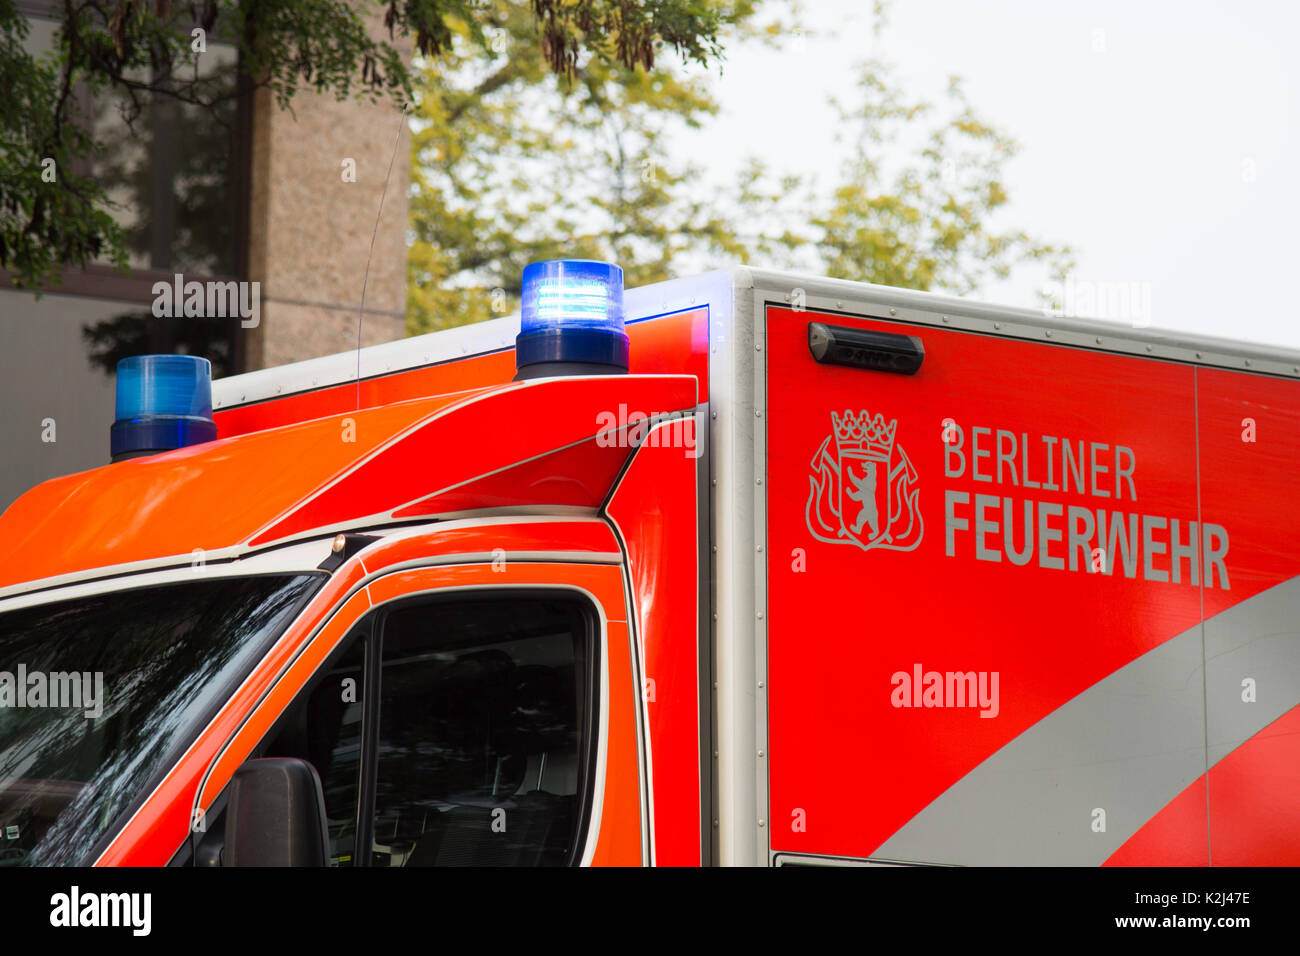 Bluelight, Berliner Feuerwehr, emergency, 21.08.2017 , Foto: Uwe Koch/fotobasis.de Stock Photo